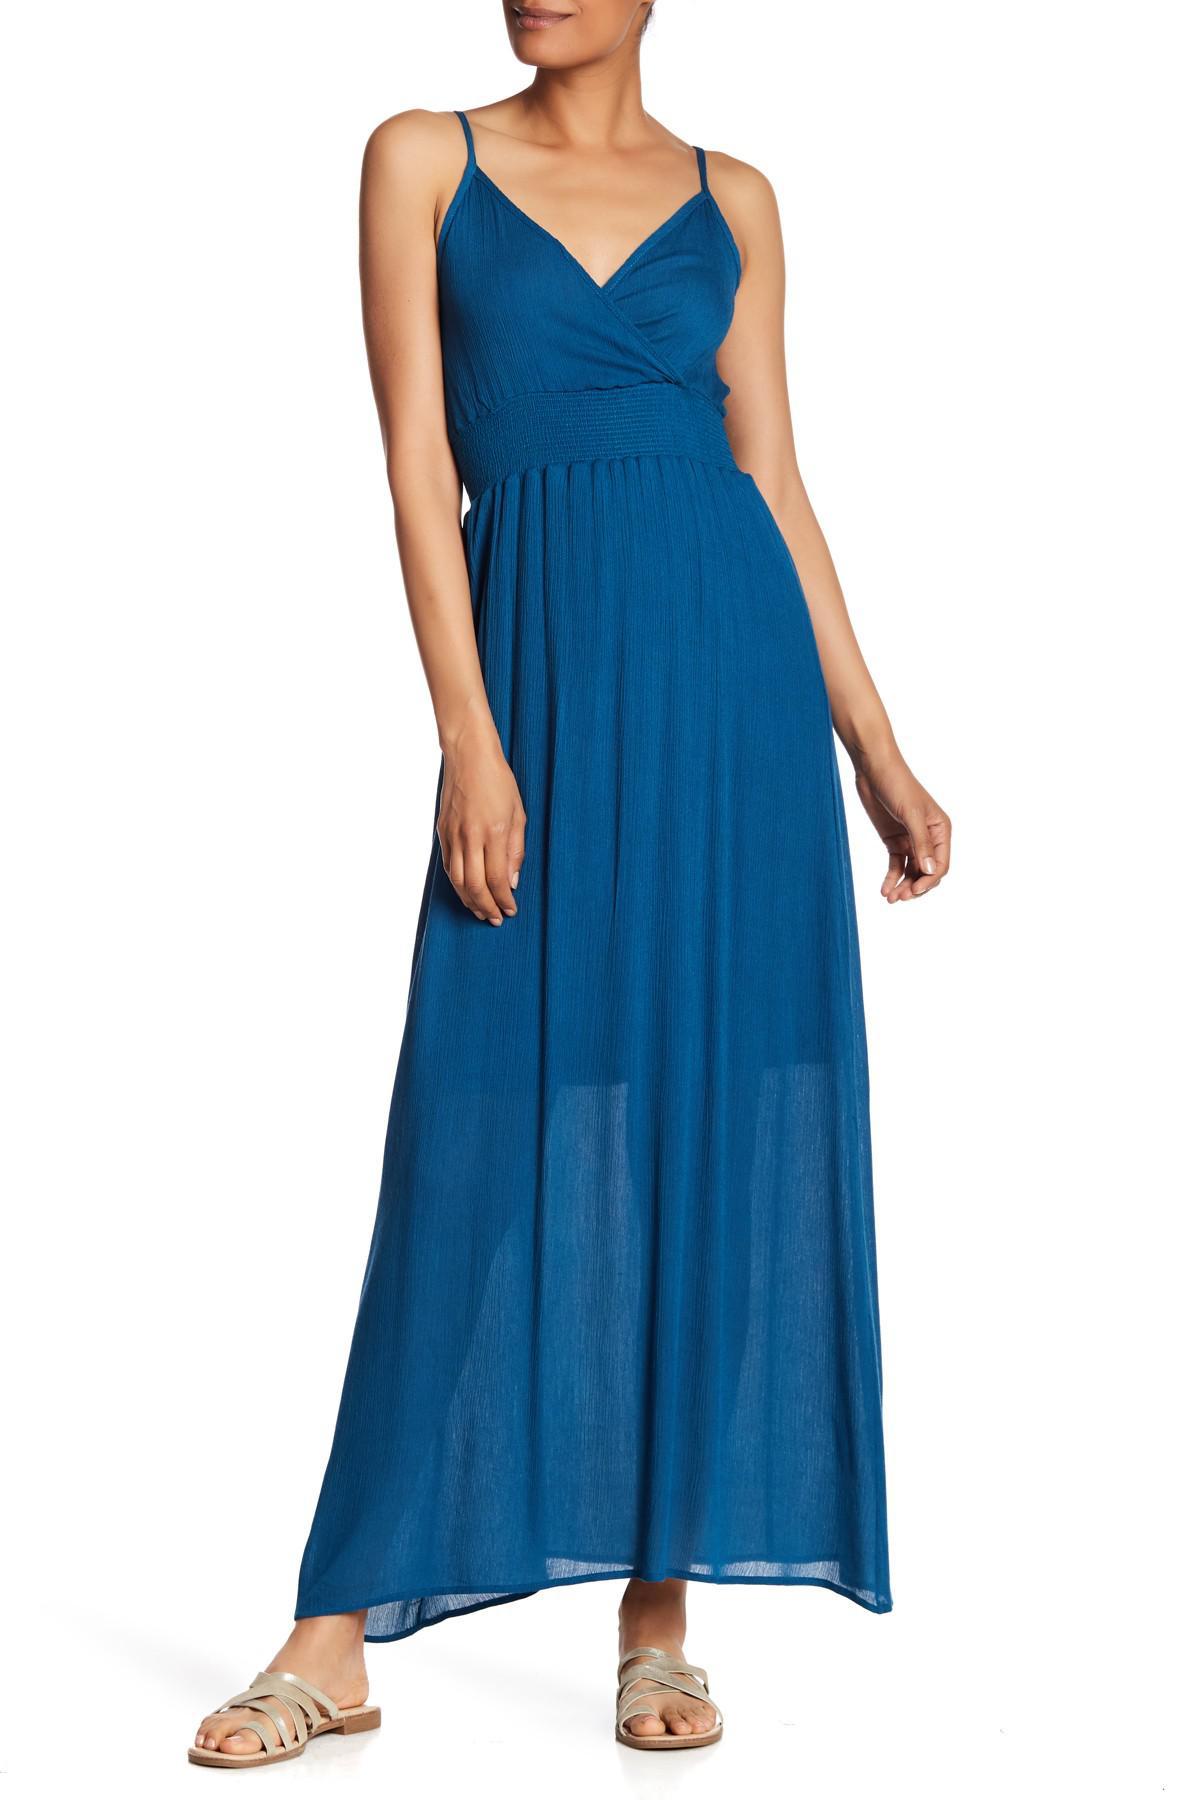 9cbe39f19e7 West Kei - Blue Gauze Maxi Dress - Lyst. View fullscreen